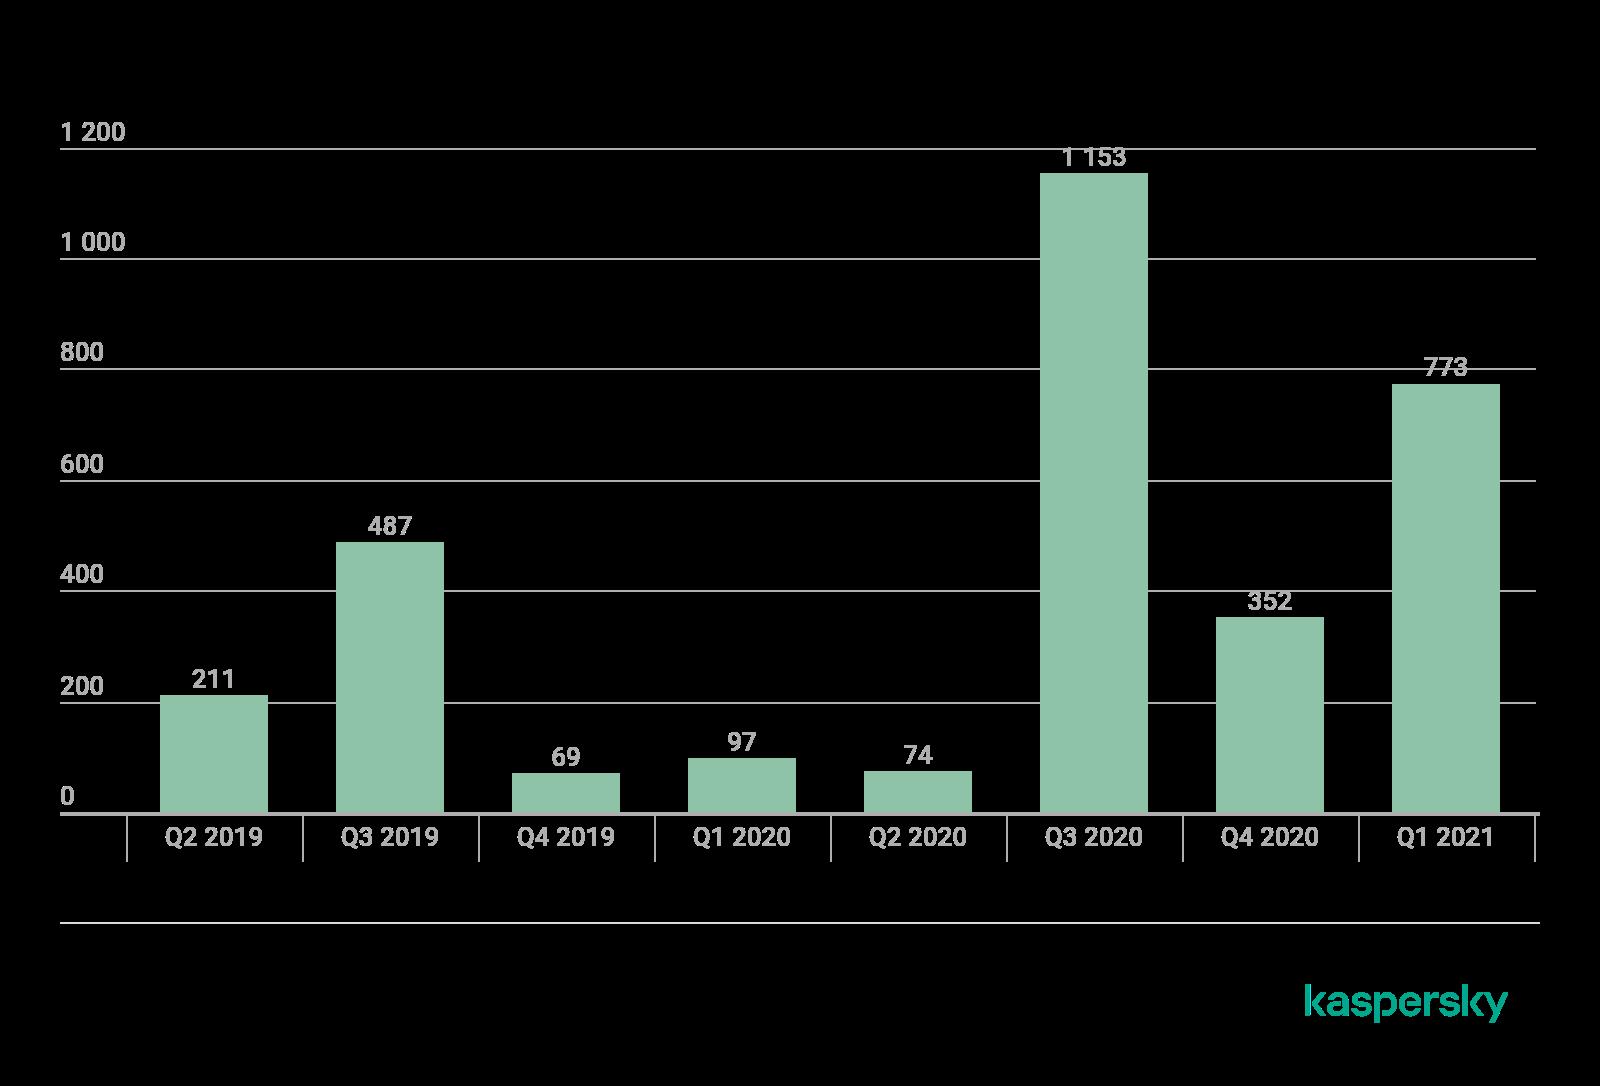 REvilによる標的型の活動が過去数四半期に大きく増加を見せた